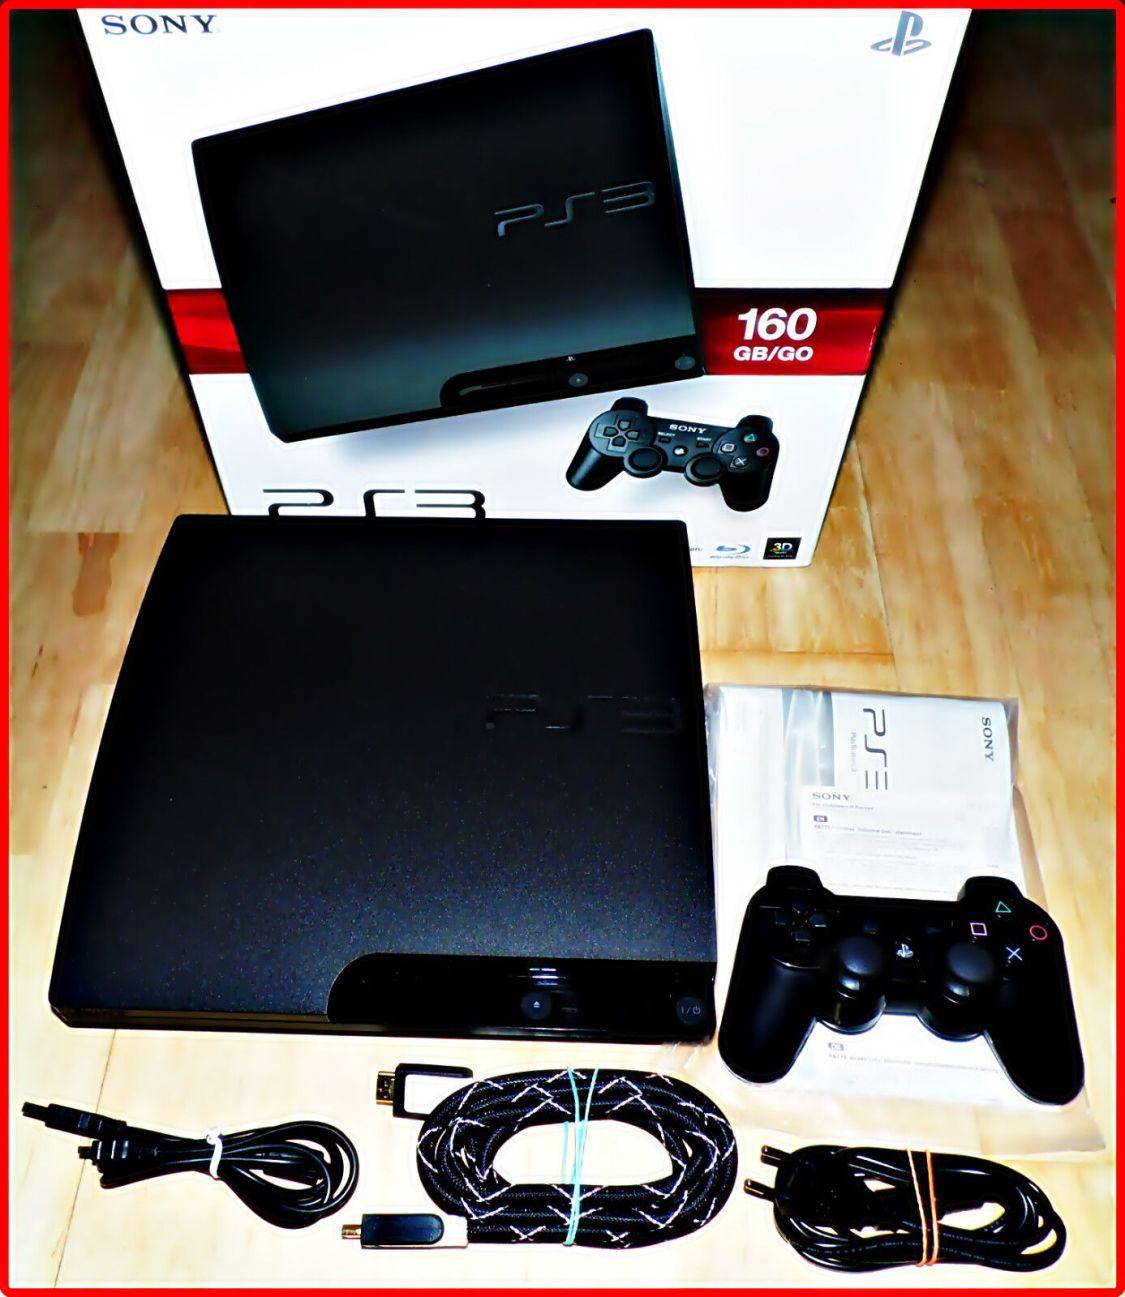 Sony Playstation 3 PS3 & ZUB Auswahl: 40-320GB SLIM/FAT +HMDI+SPIELE-OVP